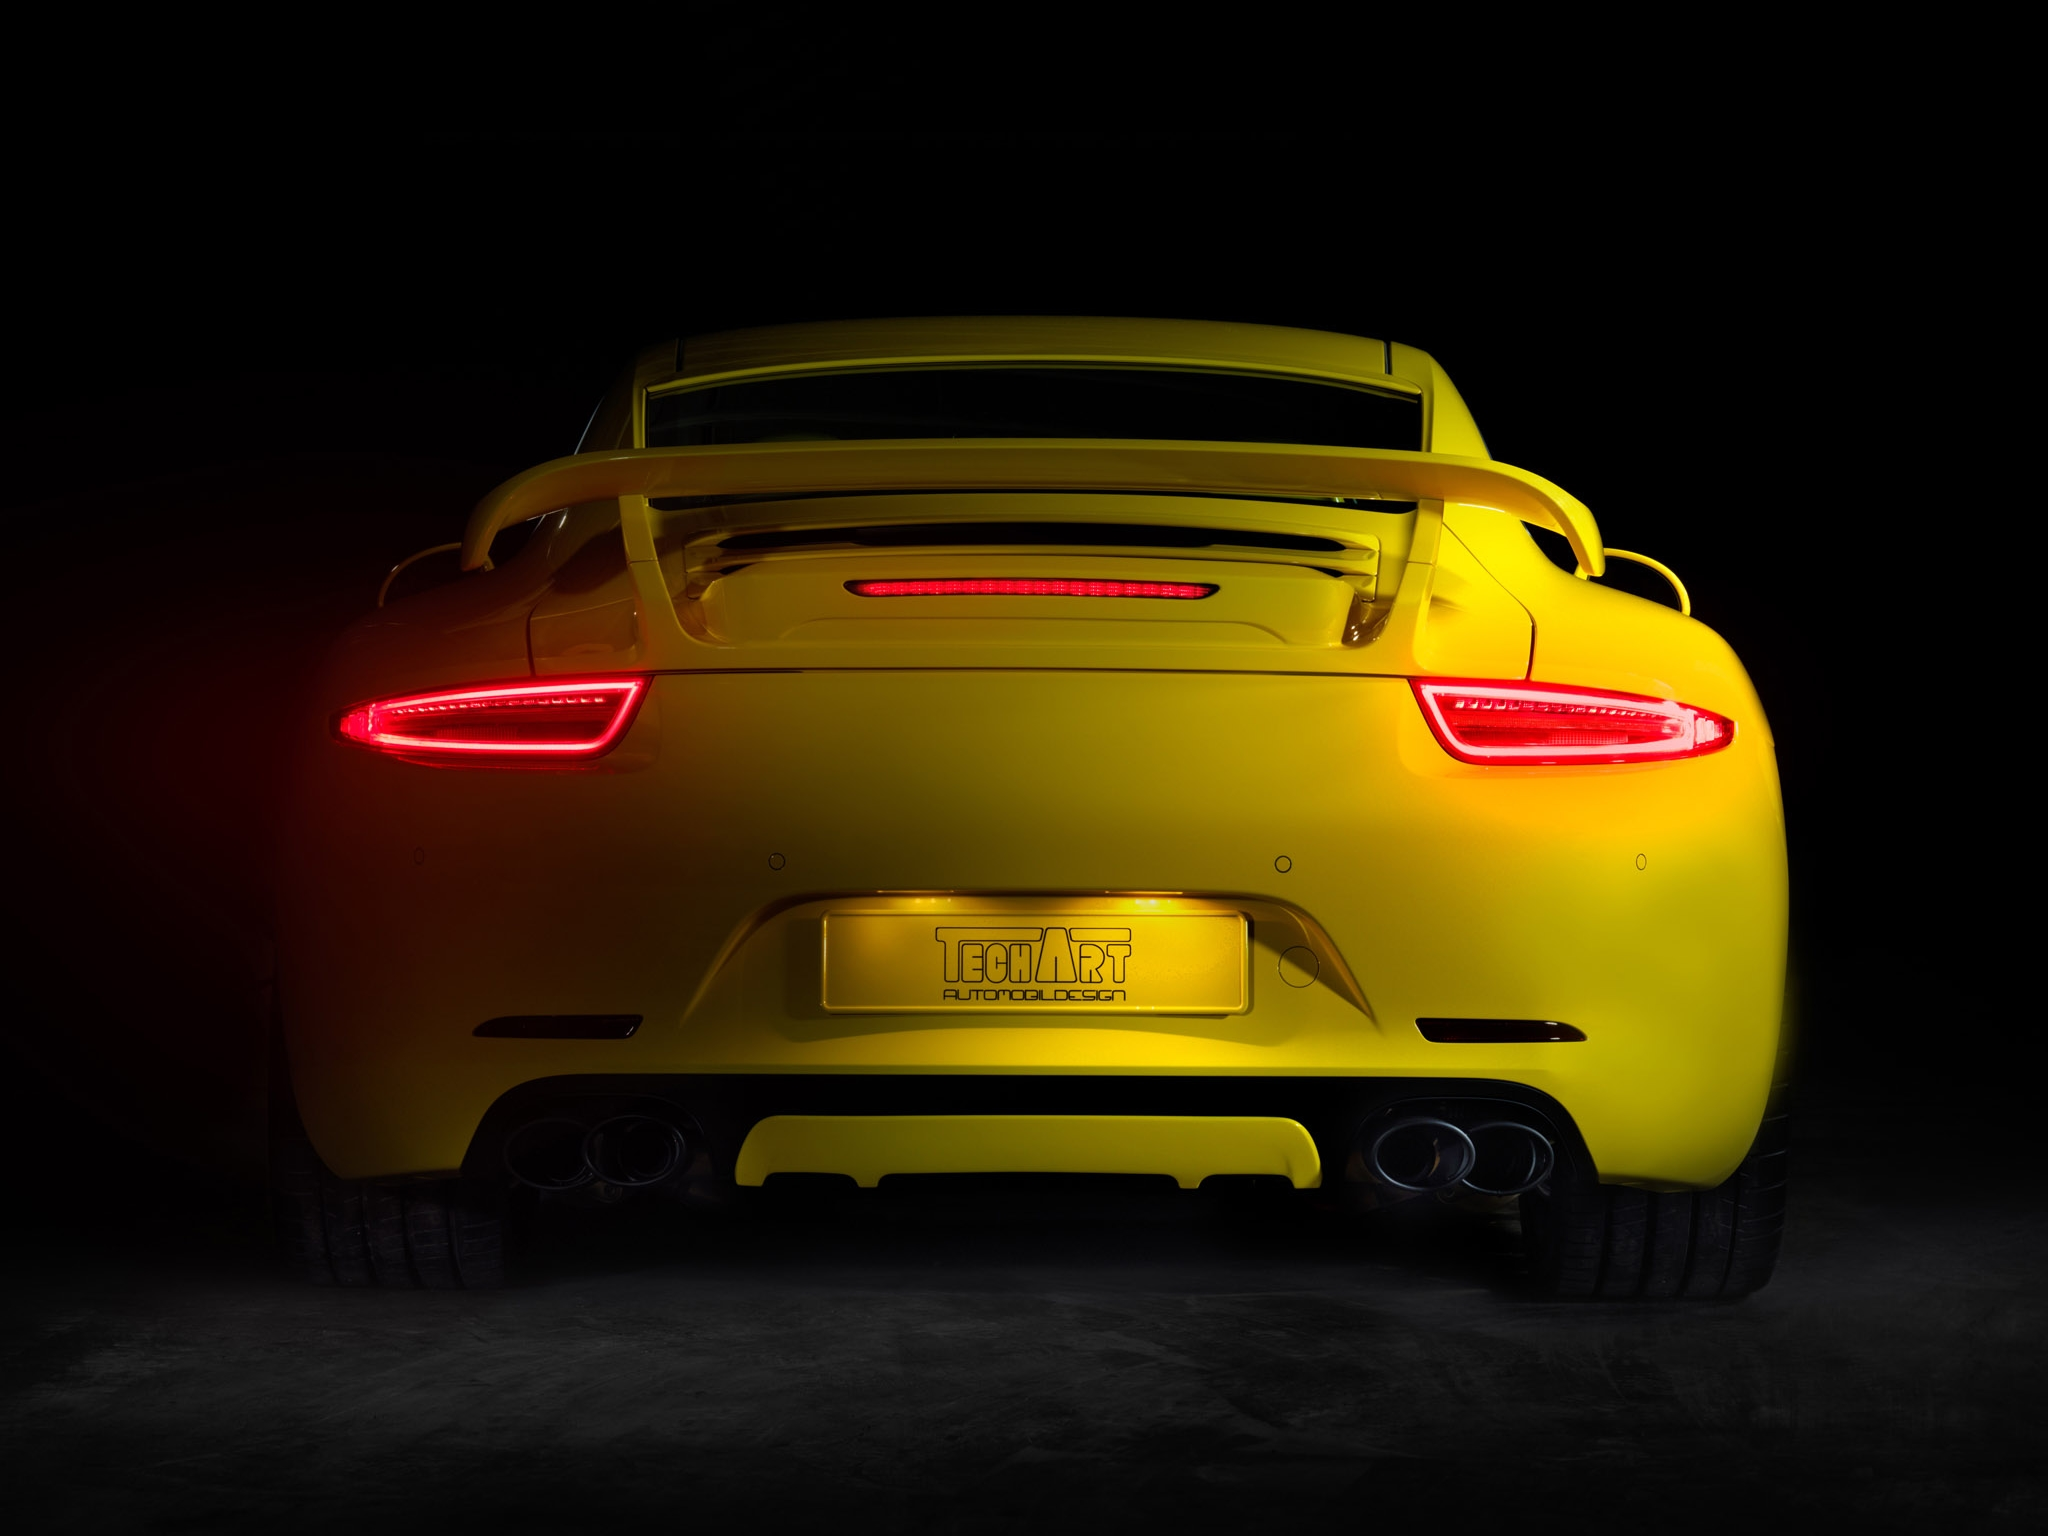 Techart Porsche 911 Carrera S Coupe 991 2012 Hd Wallpaper